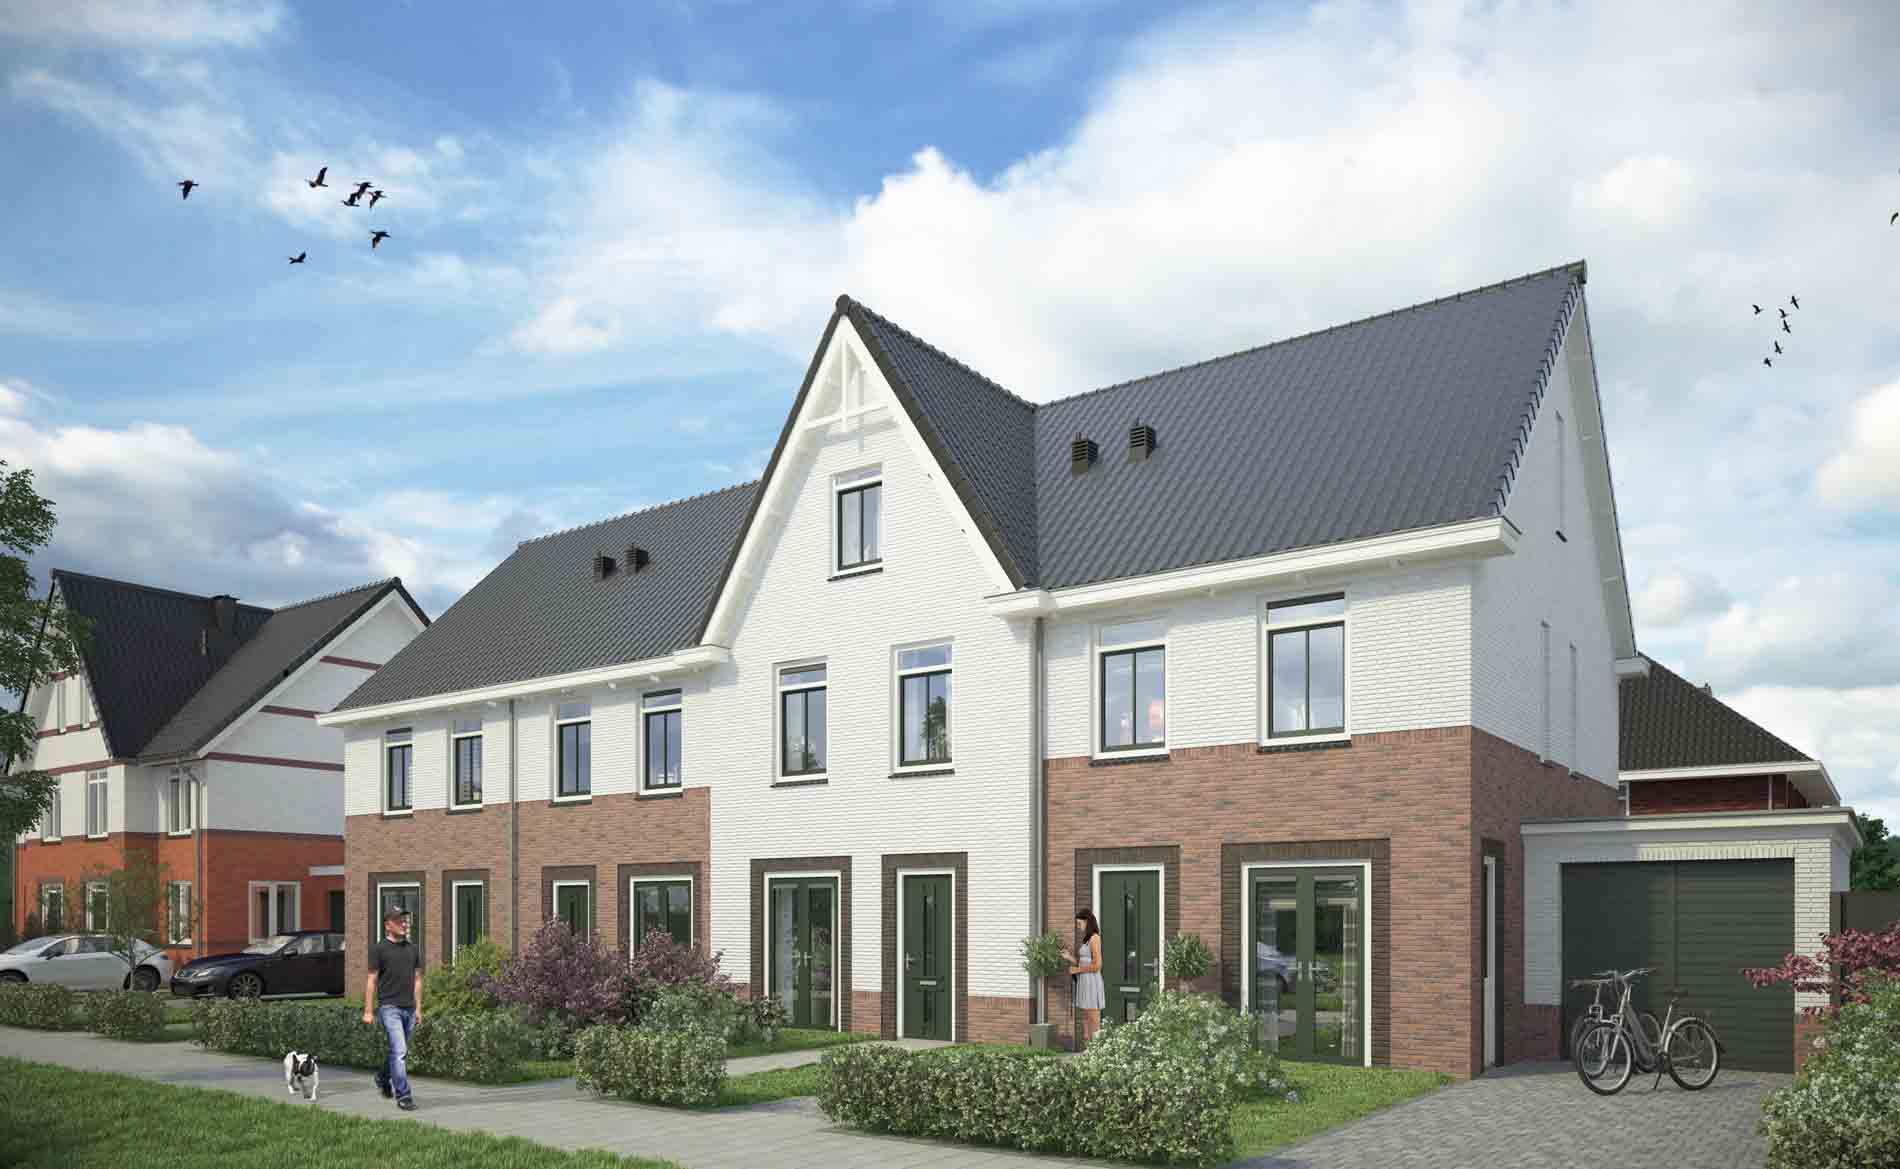 architect woningen woningbouw nieuwbouwwijk Reigersborg Hoogkarspel BBHD architecten